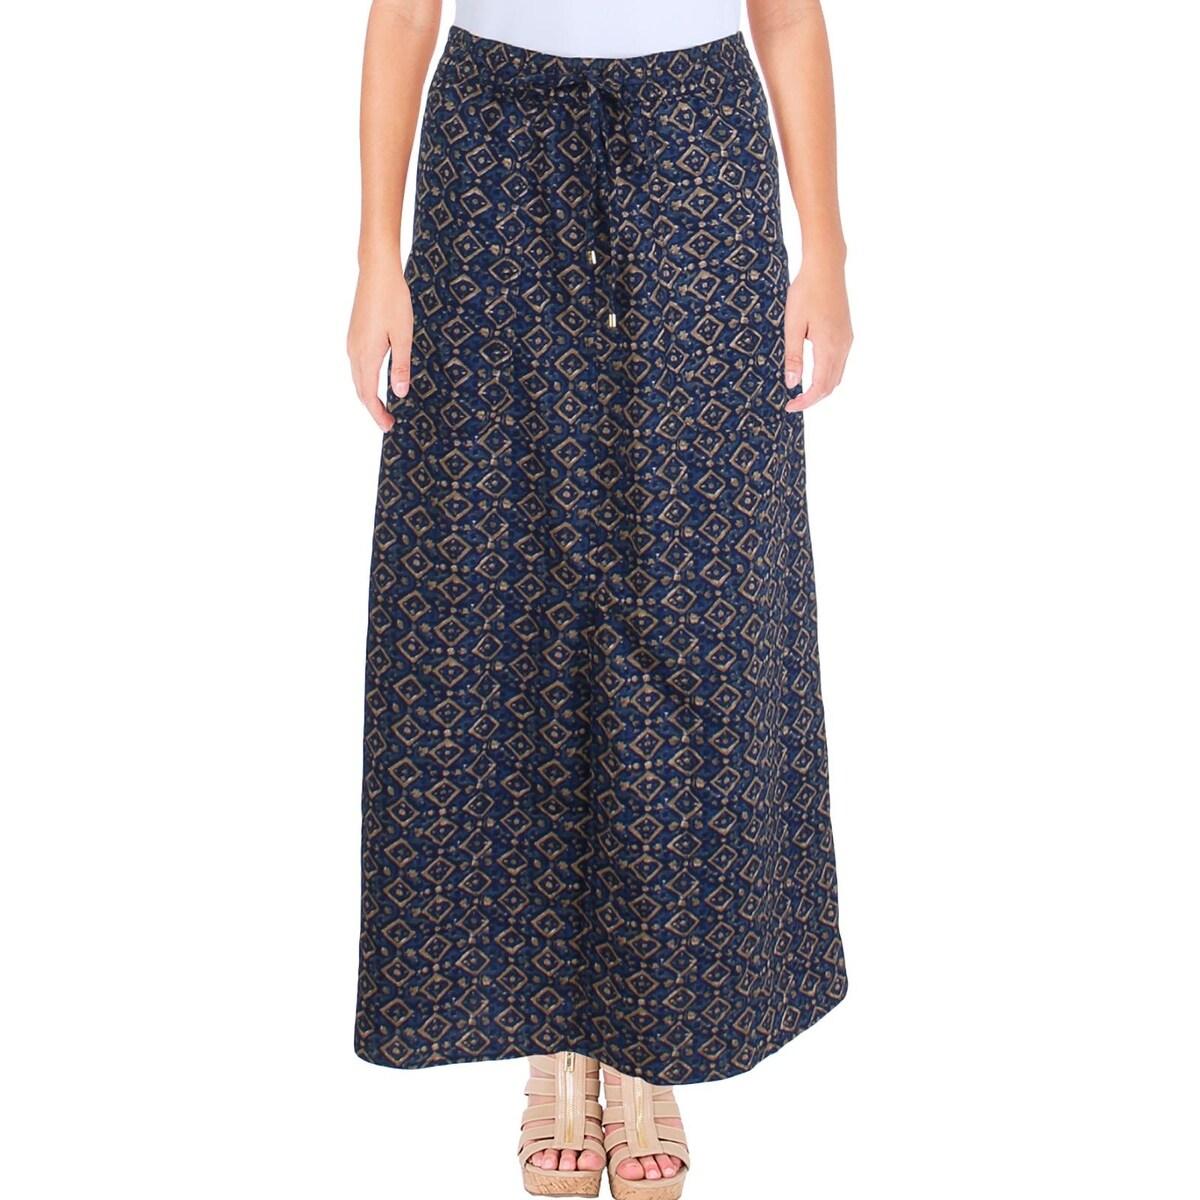 0f3985ad20 LAUREN Ralph Lauren Skirts | Find Great Women's Clothing Deals Shopping at  Overstock